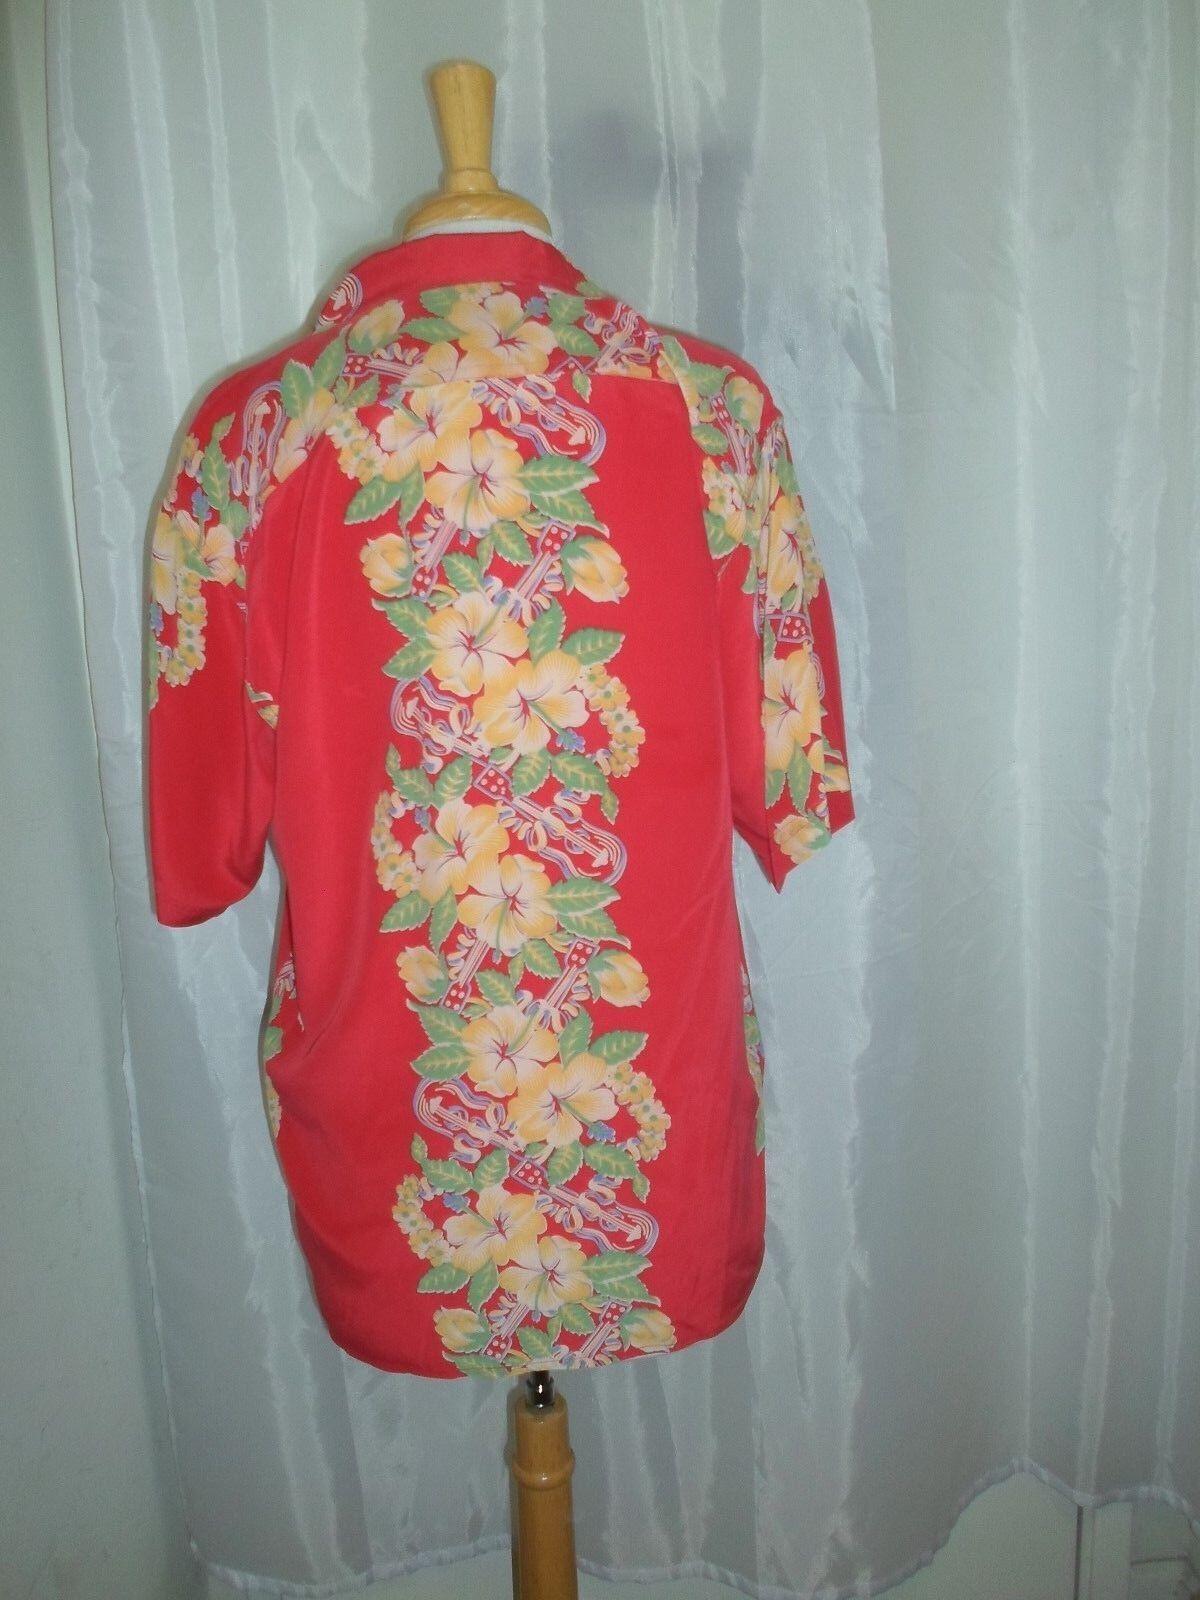 Avanti S rosso giallo Lei Lavender Ukulele Ukulele Lavender Hawaiian Aloha Shirt c2b314